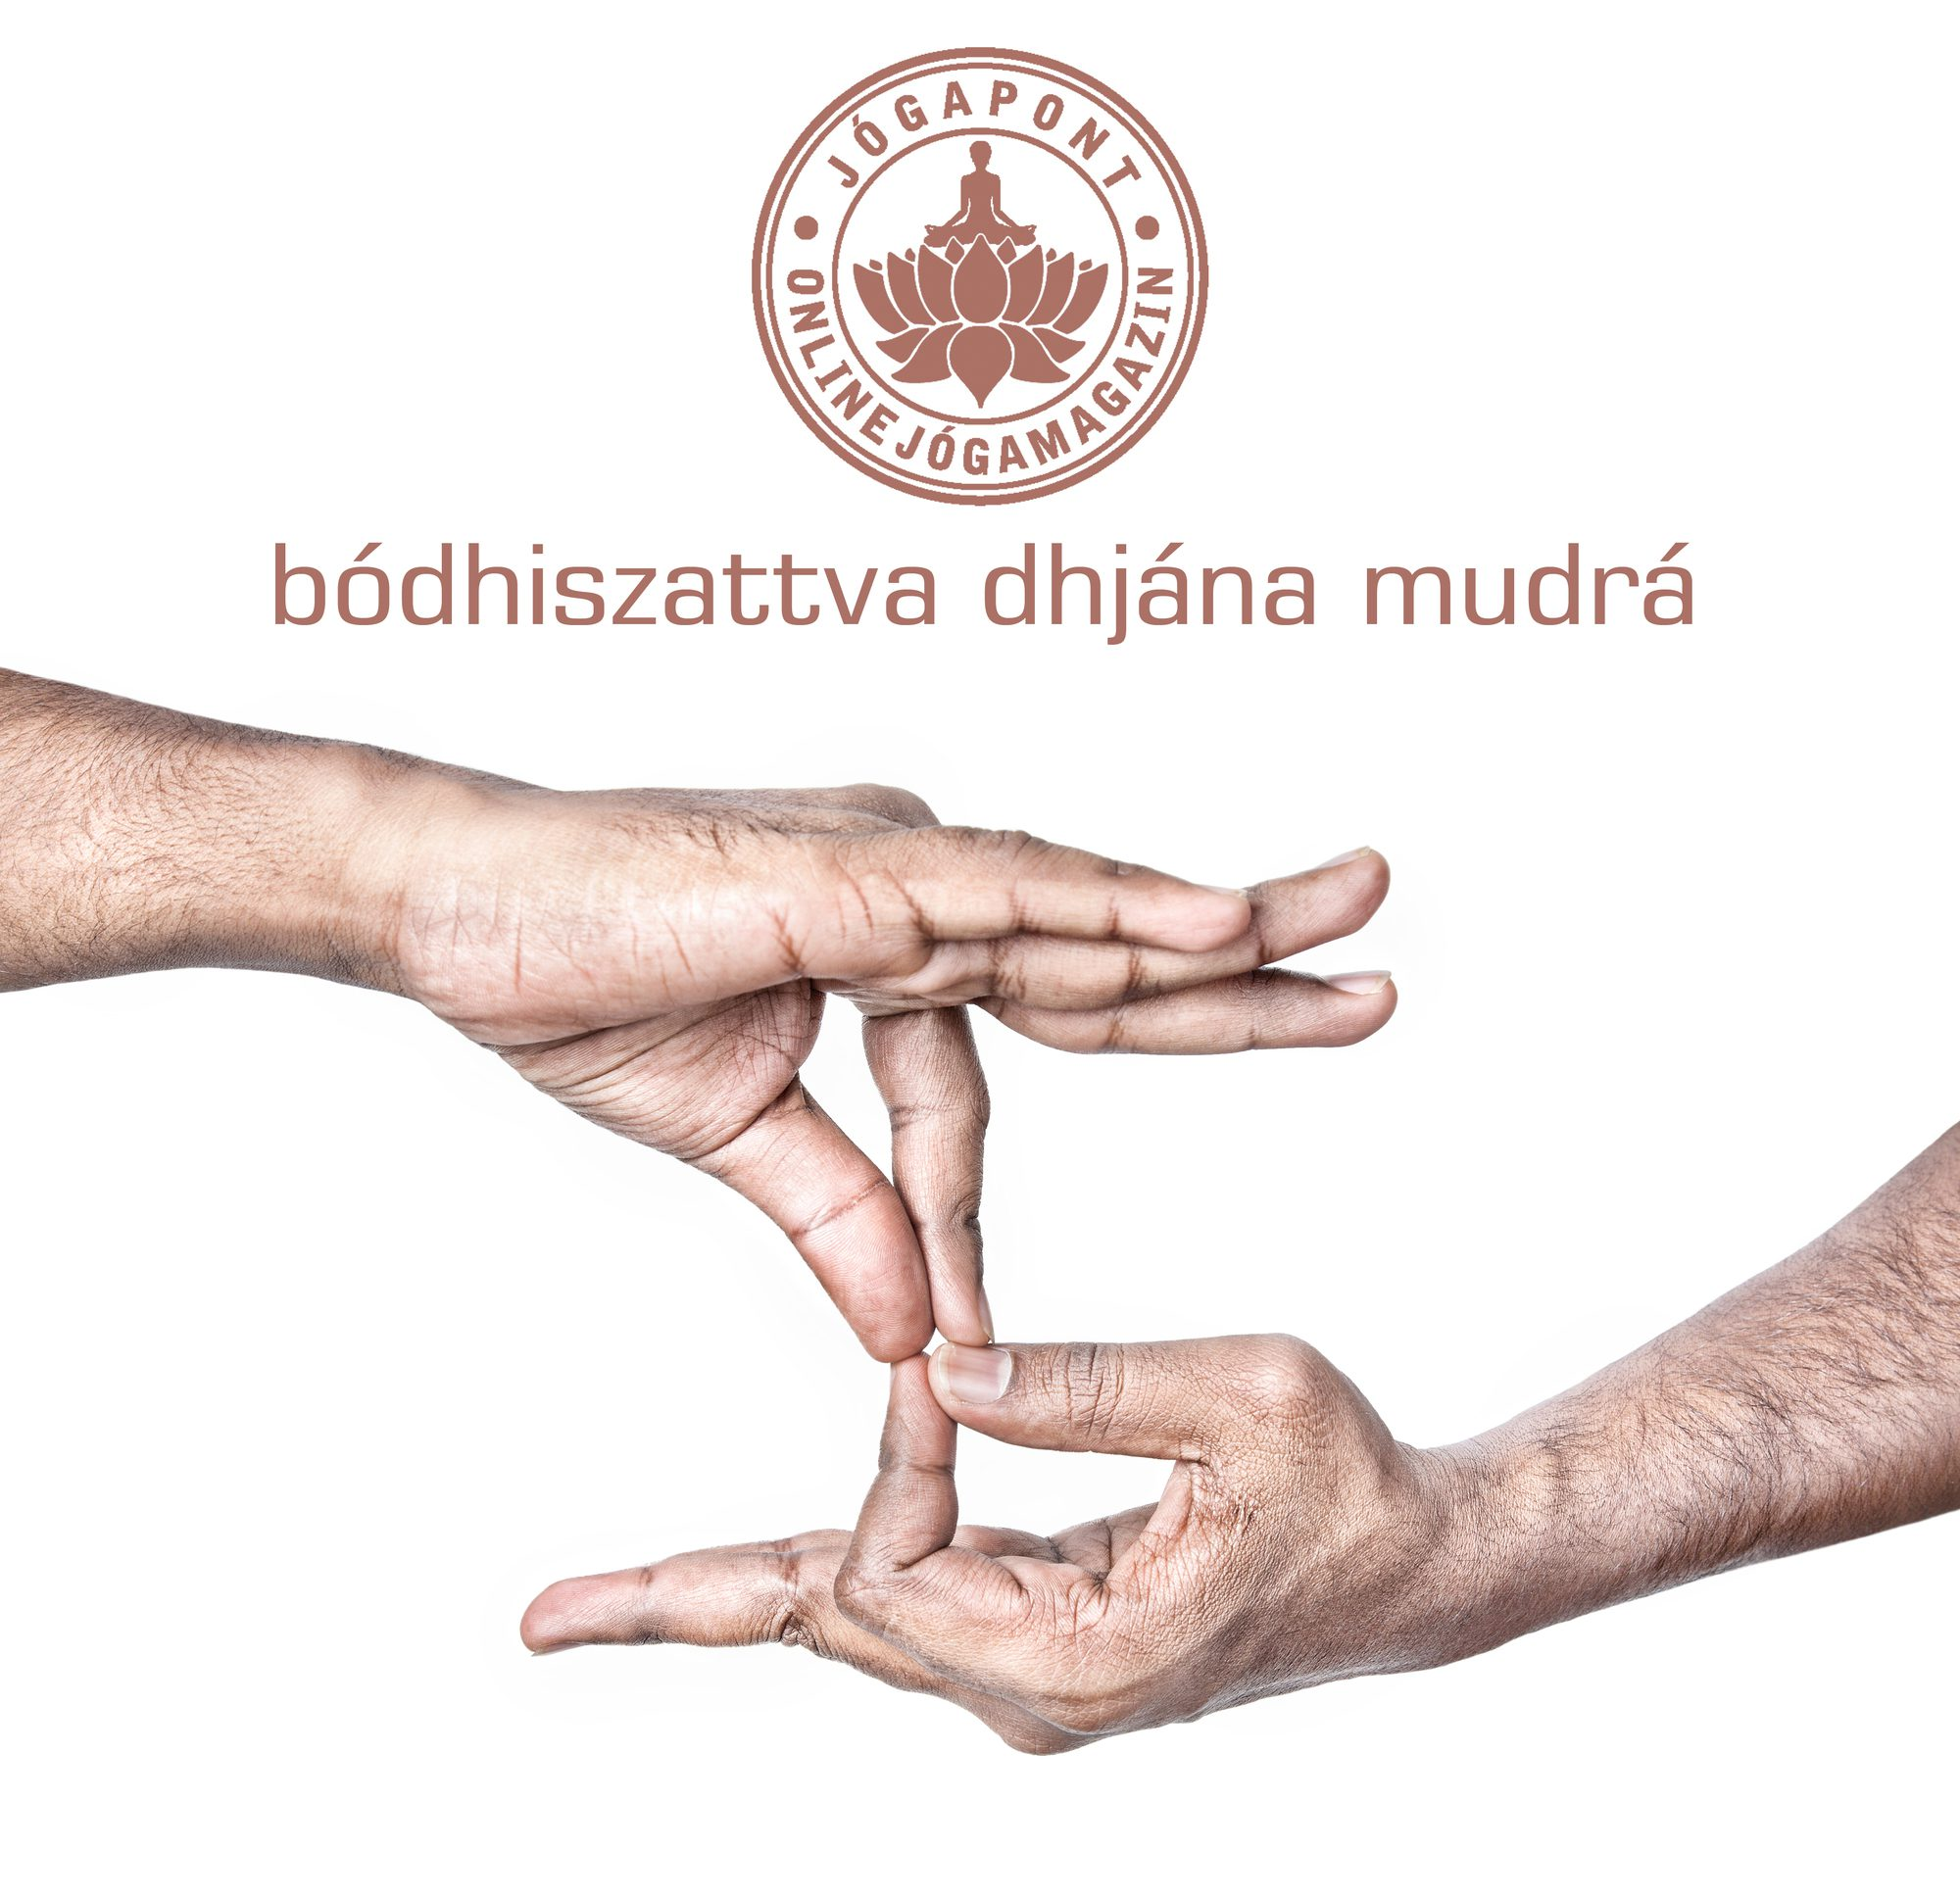 Bódhiszattva dhjána mudrá